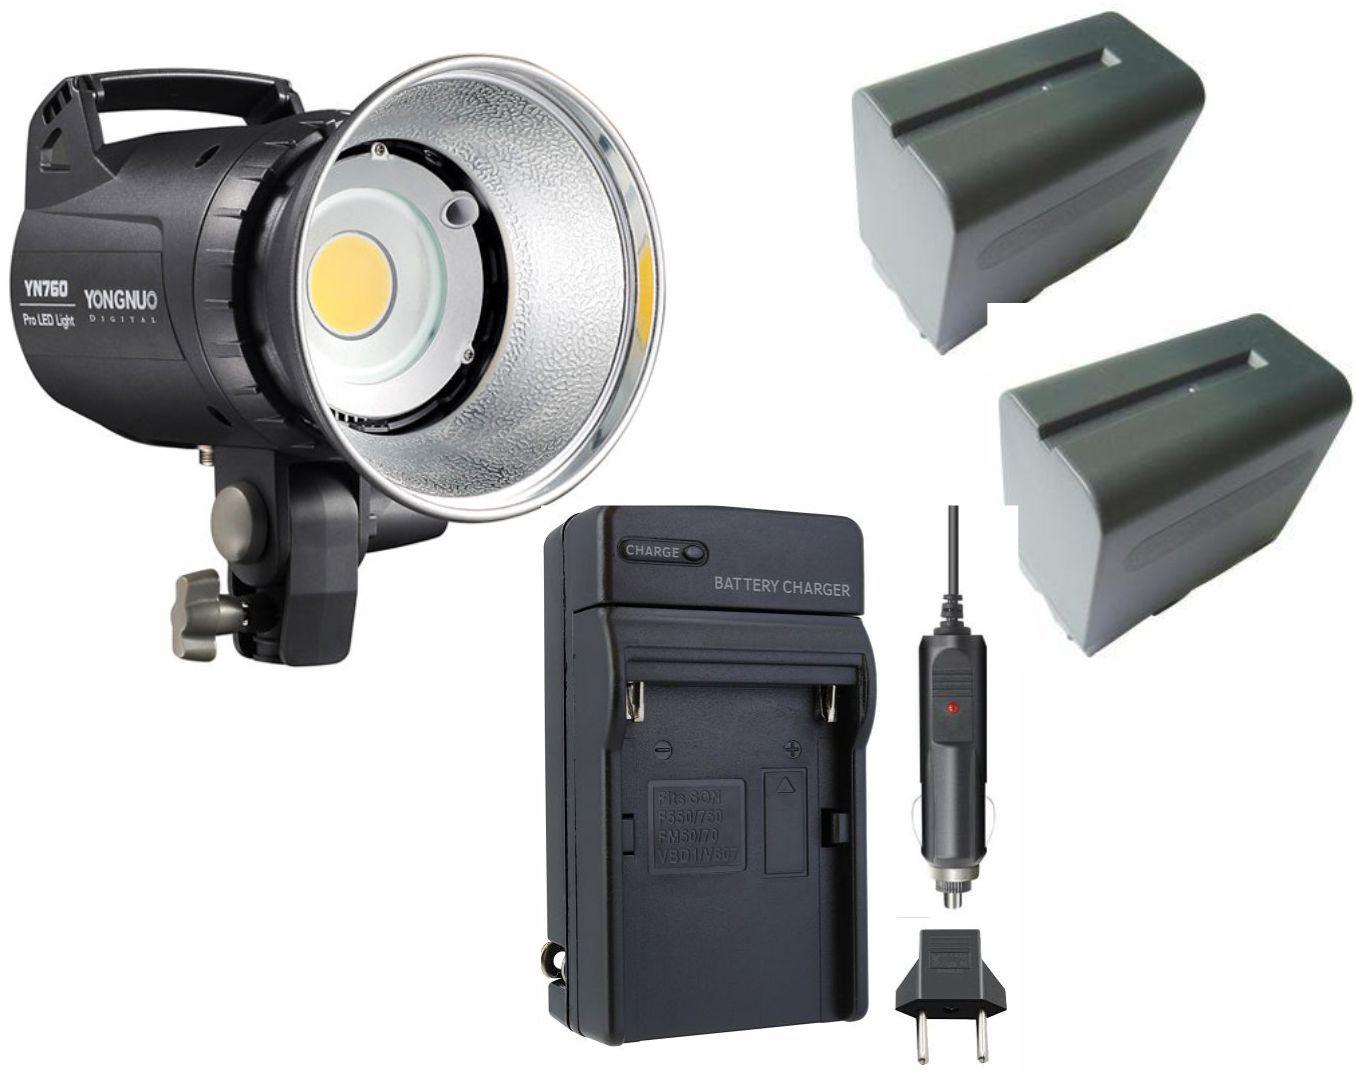 Iluminador de LED Yongnuo YN760 + 2 Baterias NP-F970 + Carregador